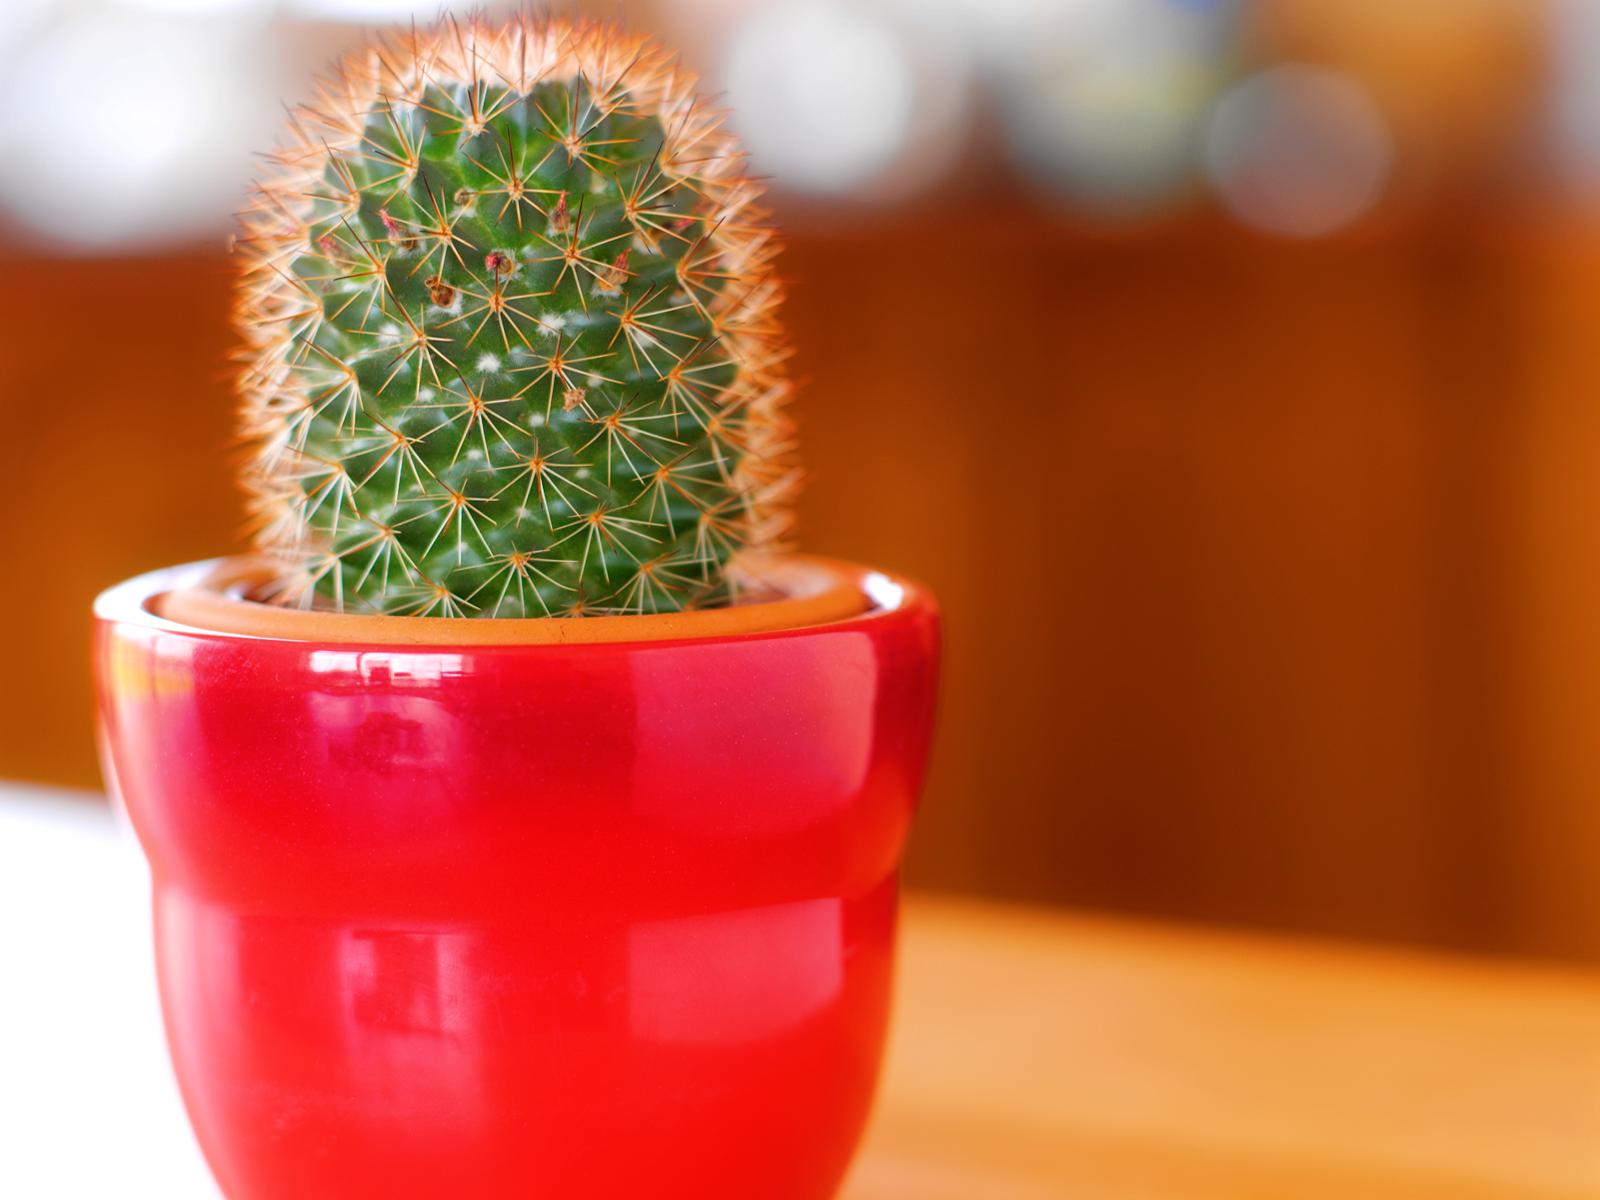 small cactus computer hd wallpaper 51663